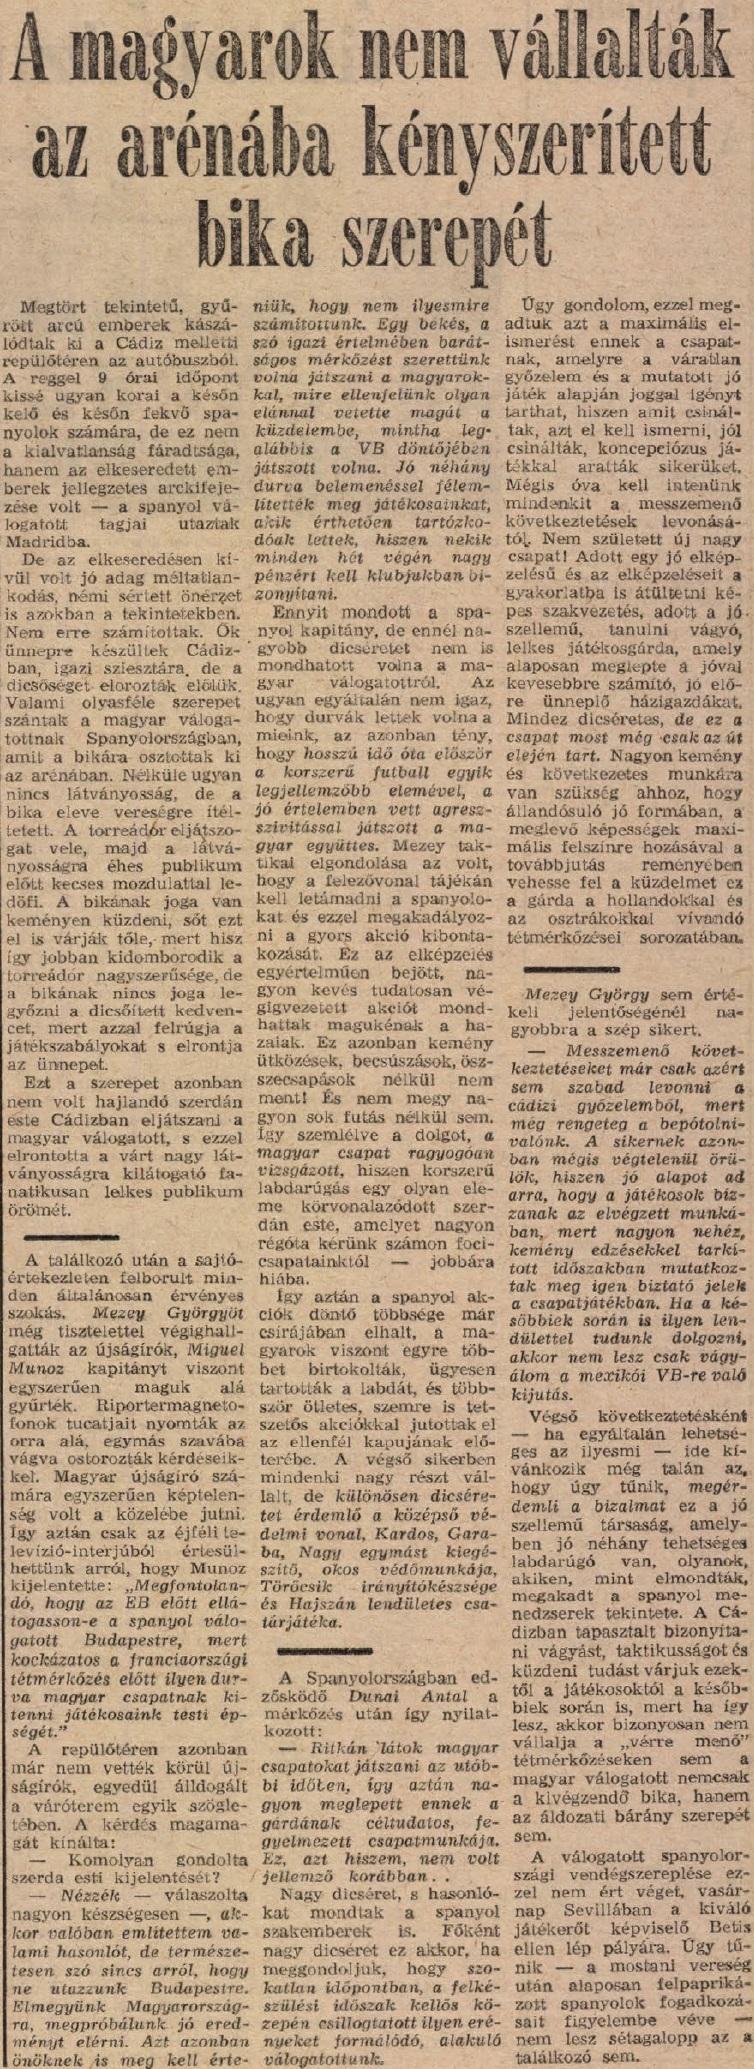 idokapszula_nb_i_1983_84_spanyolorszag_magyarorszag_merkozes_2.jpg